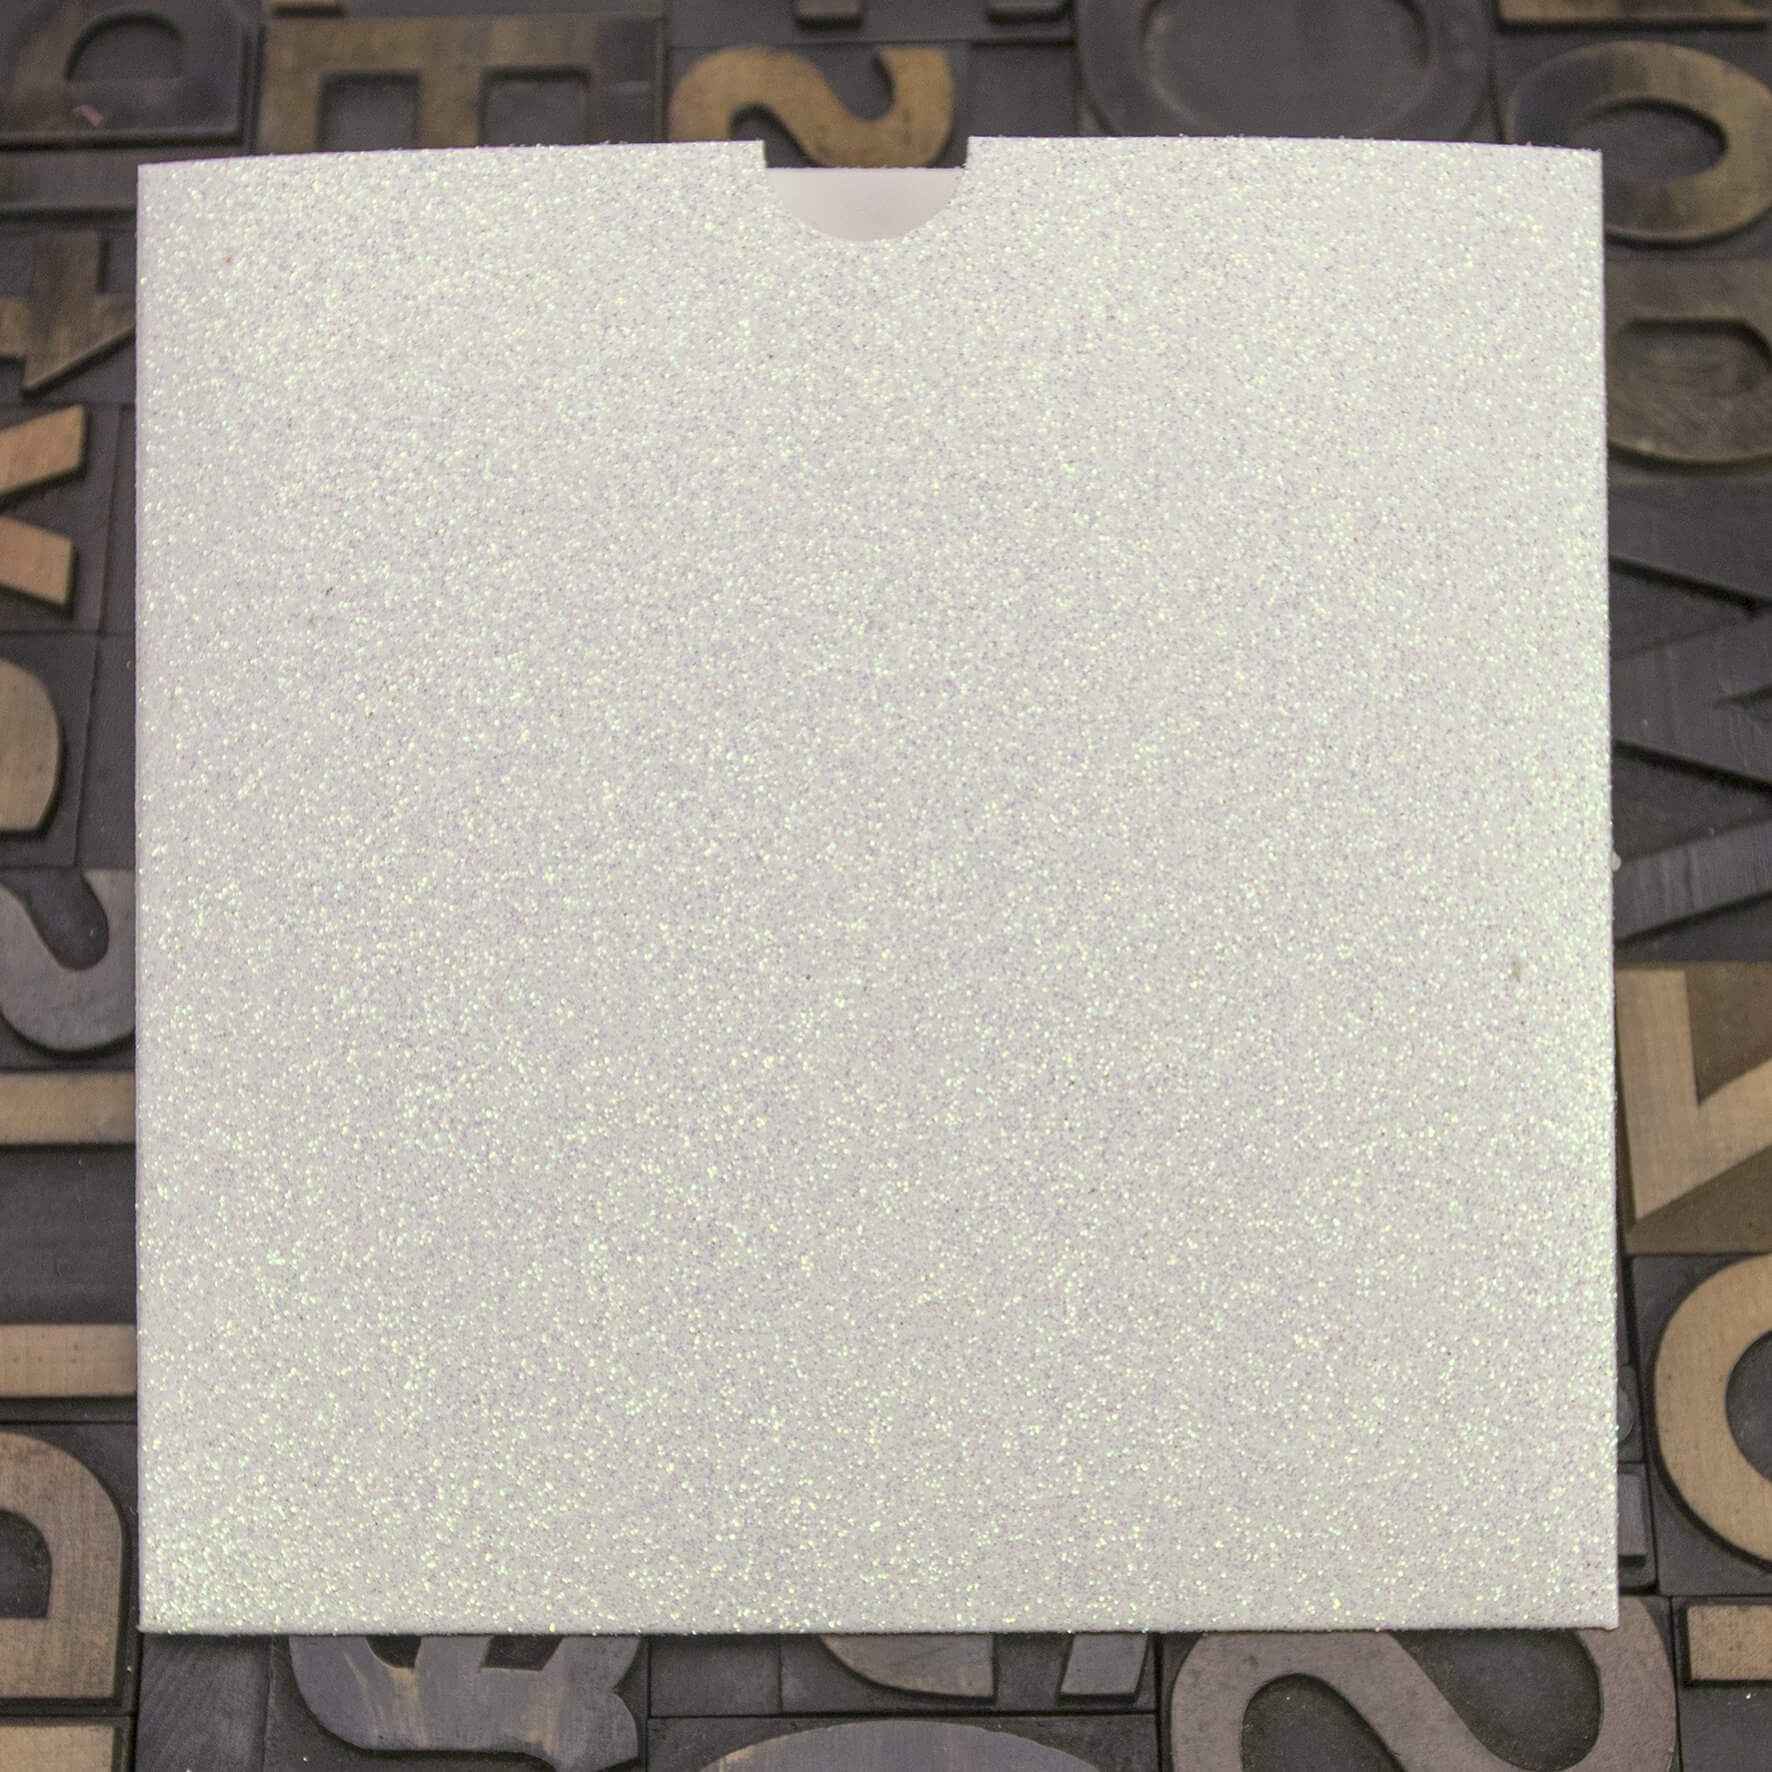 Enfolio Wallet 146mm Sq - Iridescent White Glitter Card